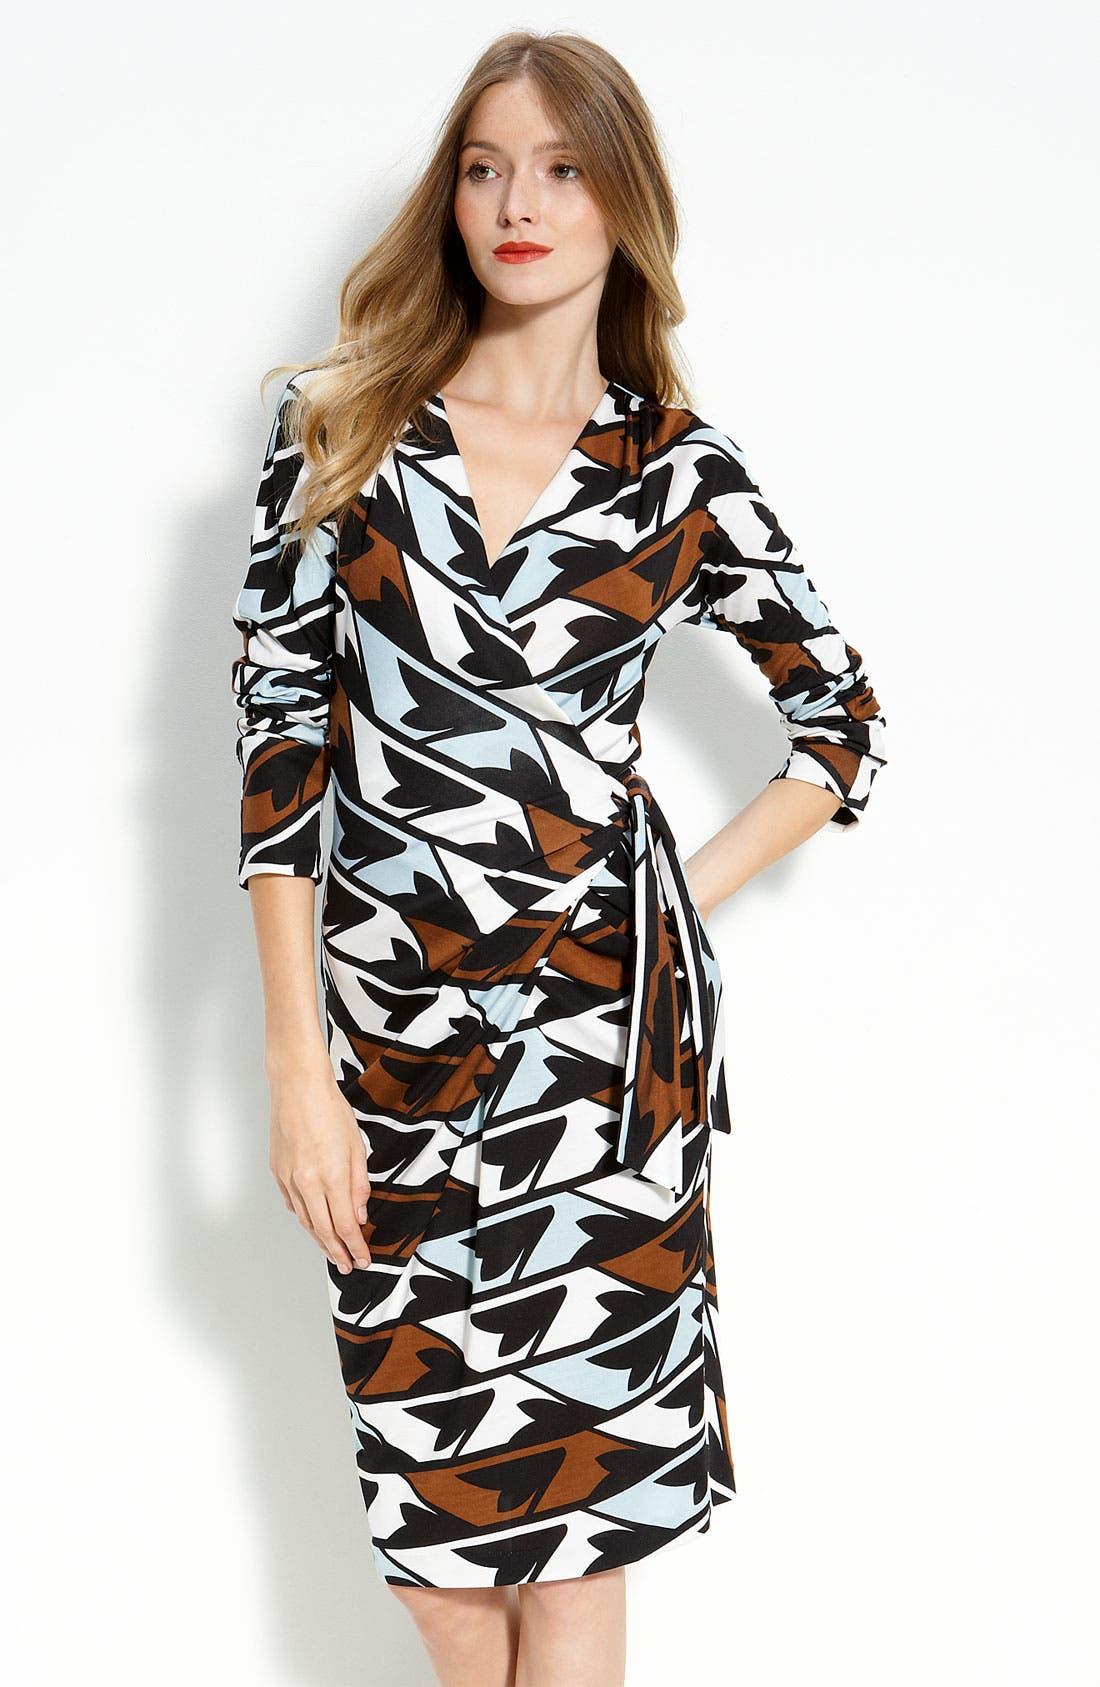 Alternate Image 1 Selected - Diane von Furstenberg 'Ember' Faux Wrap Dress